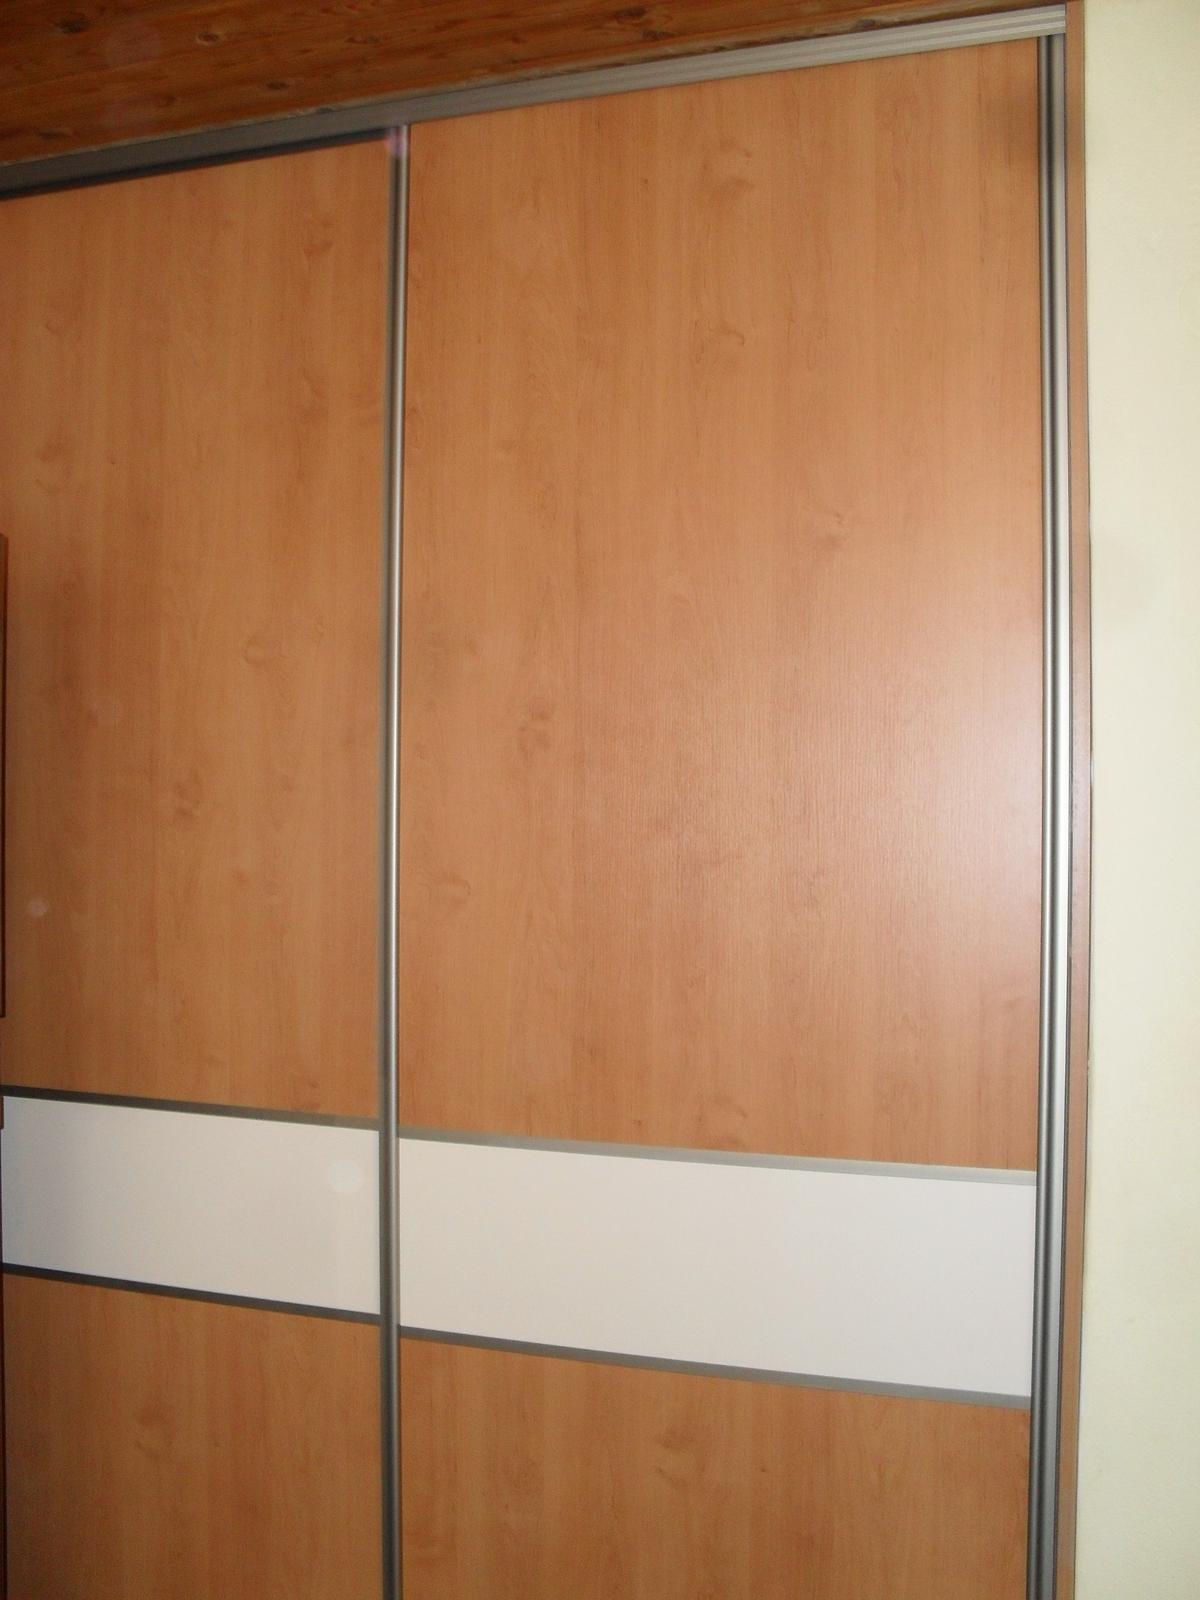 Vstavané skrine Martin Benko Bošany - Obrázok č. 33